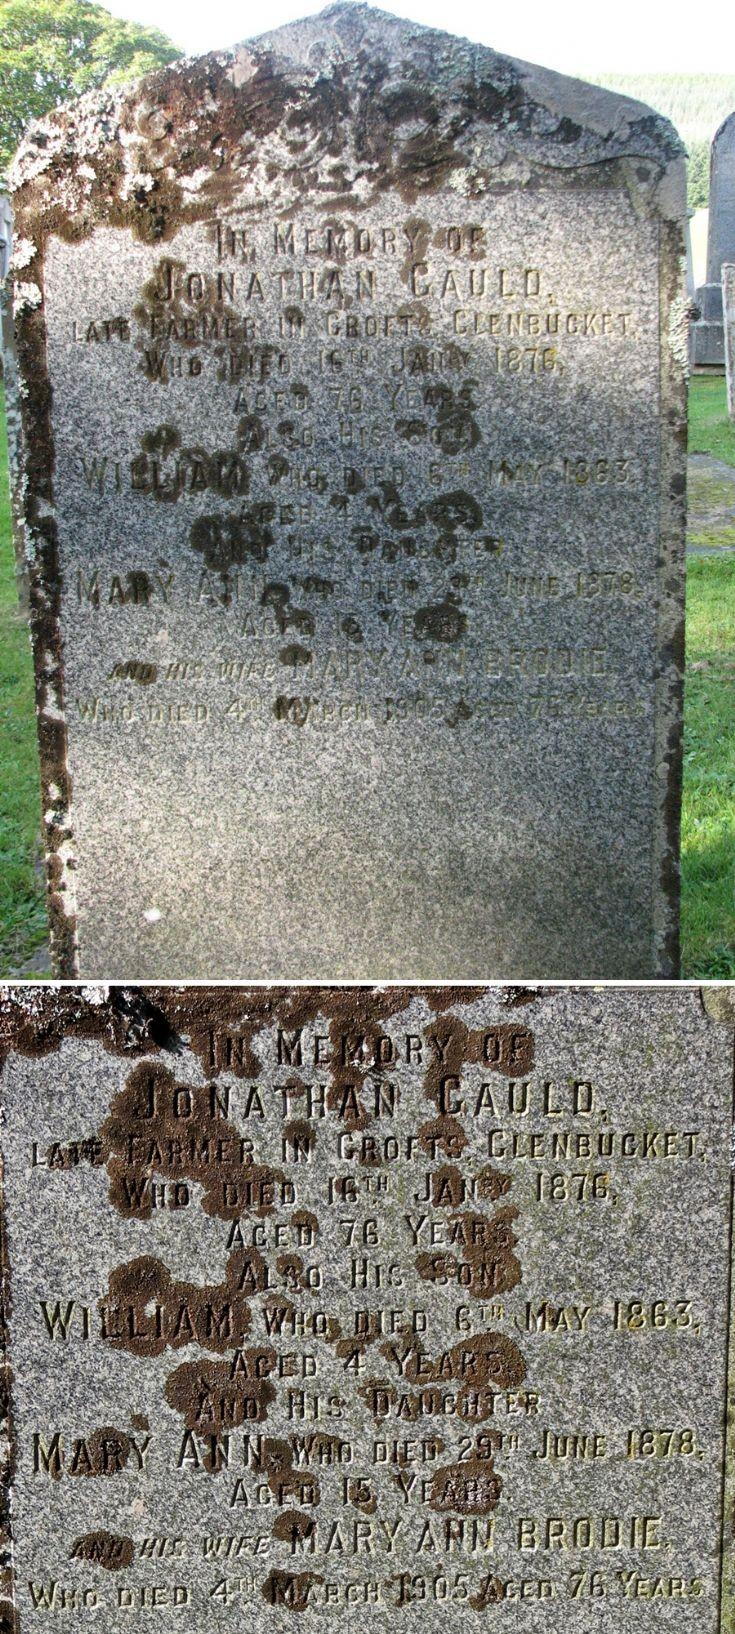 34 Grave Stone No 35 Jonathan Gauld